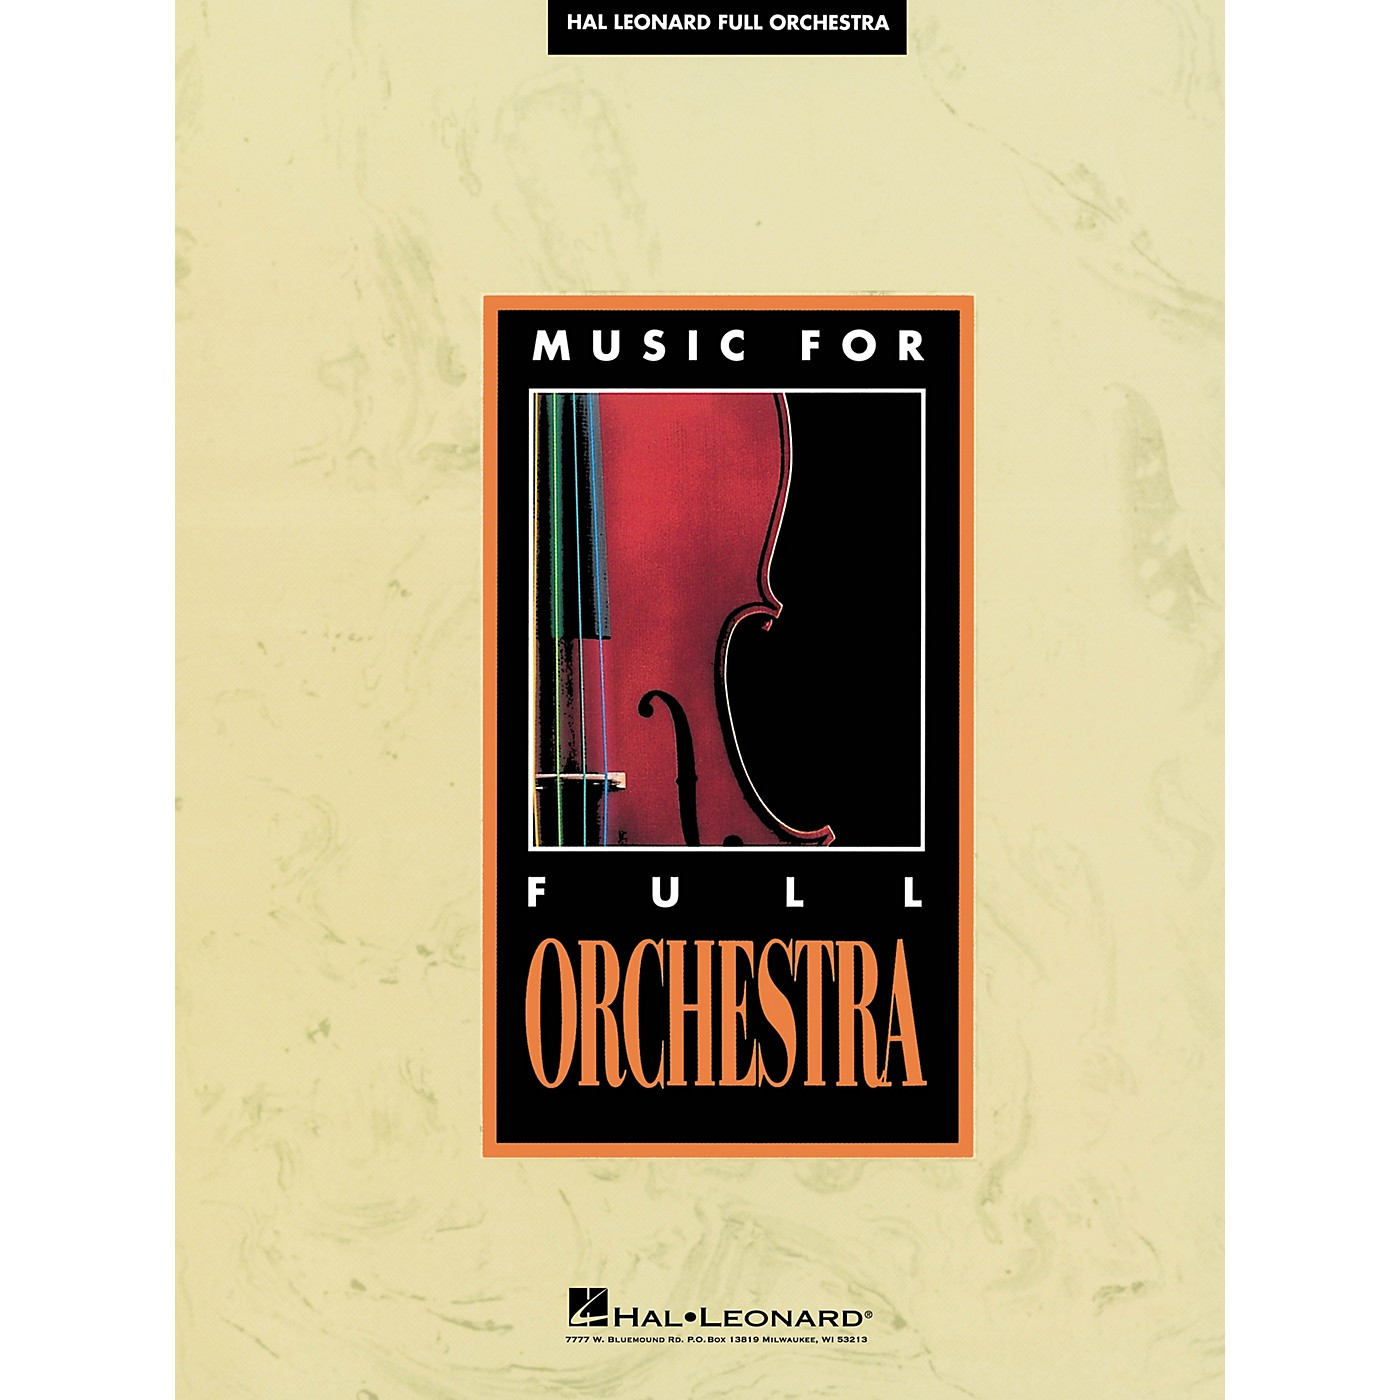 Ricordi Concerto in E Minor for 4 Violins Strings and Basso Continuo, Op.3 No.4, RV550 Orchestra by Vivaldi thumbnail